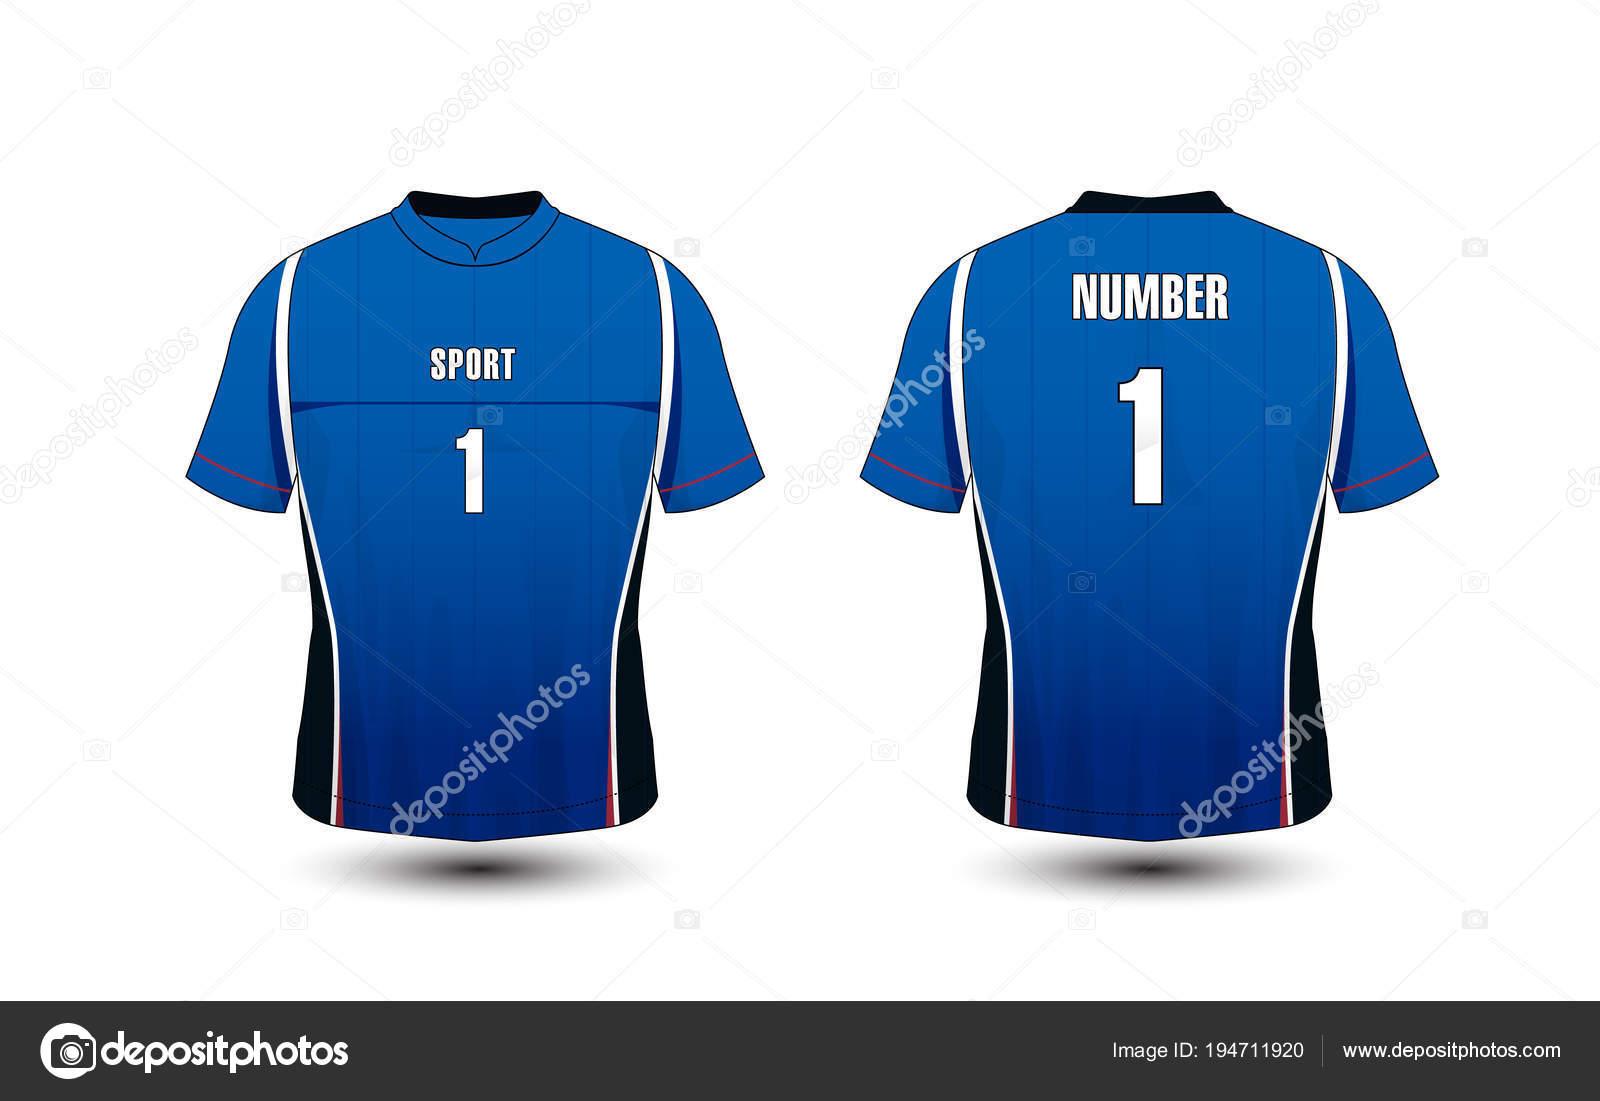 Blue And White Layout Sport T Shirt Kits Jersey Shirt Design